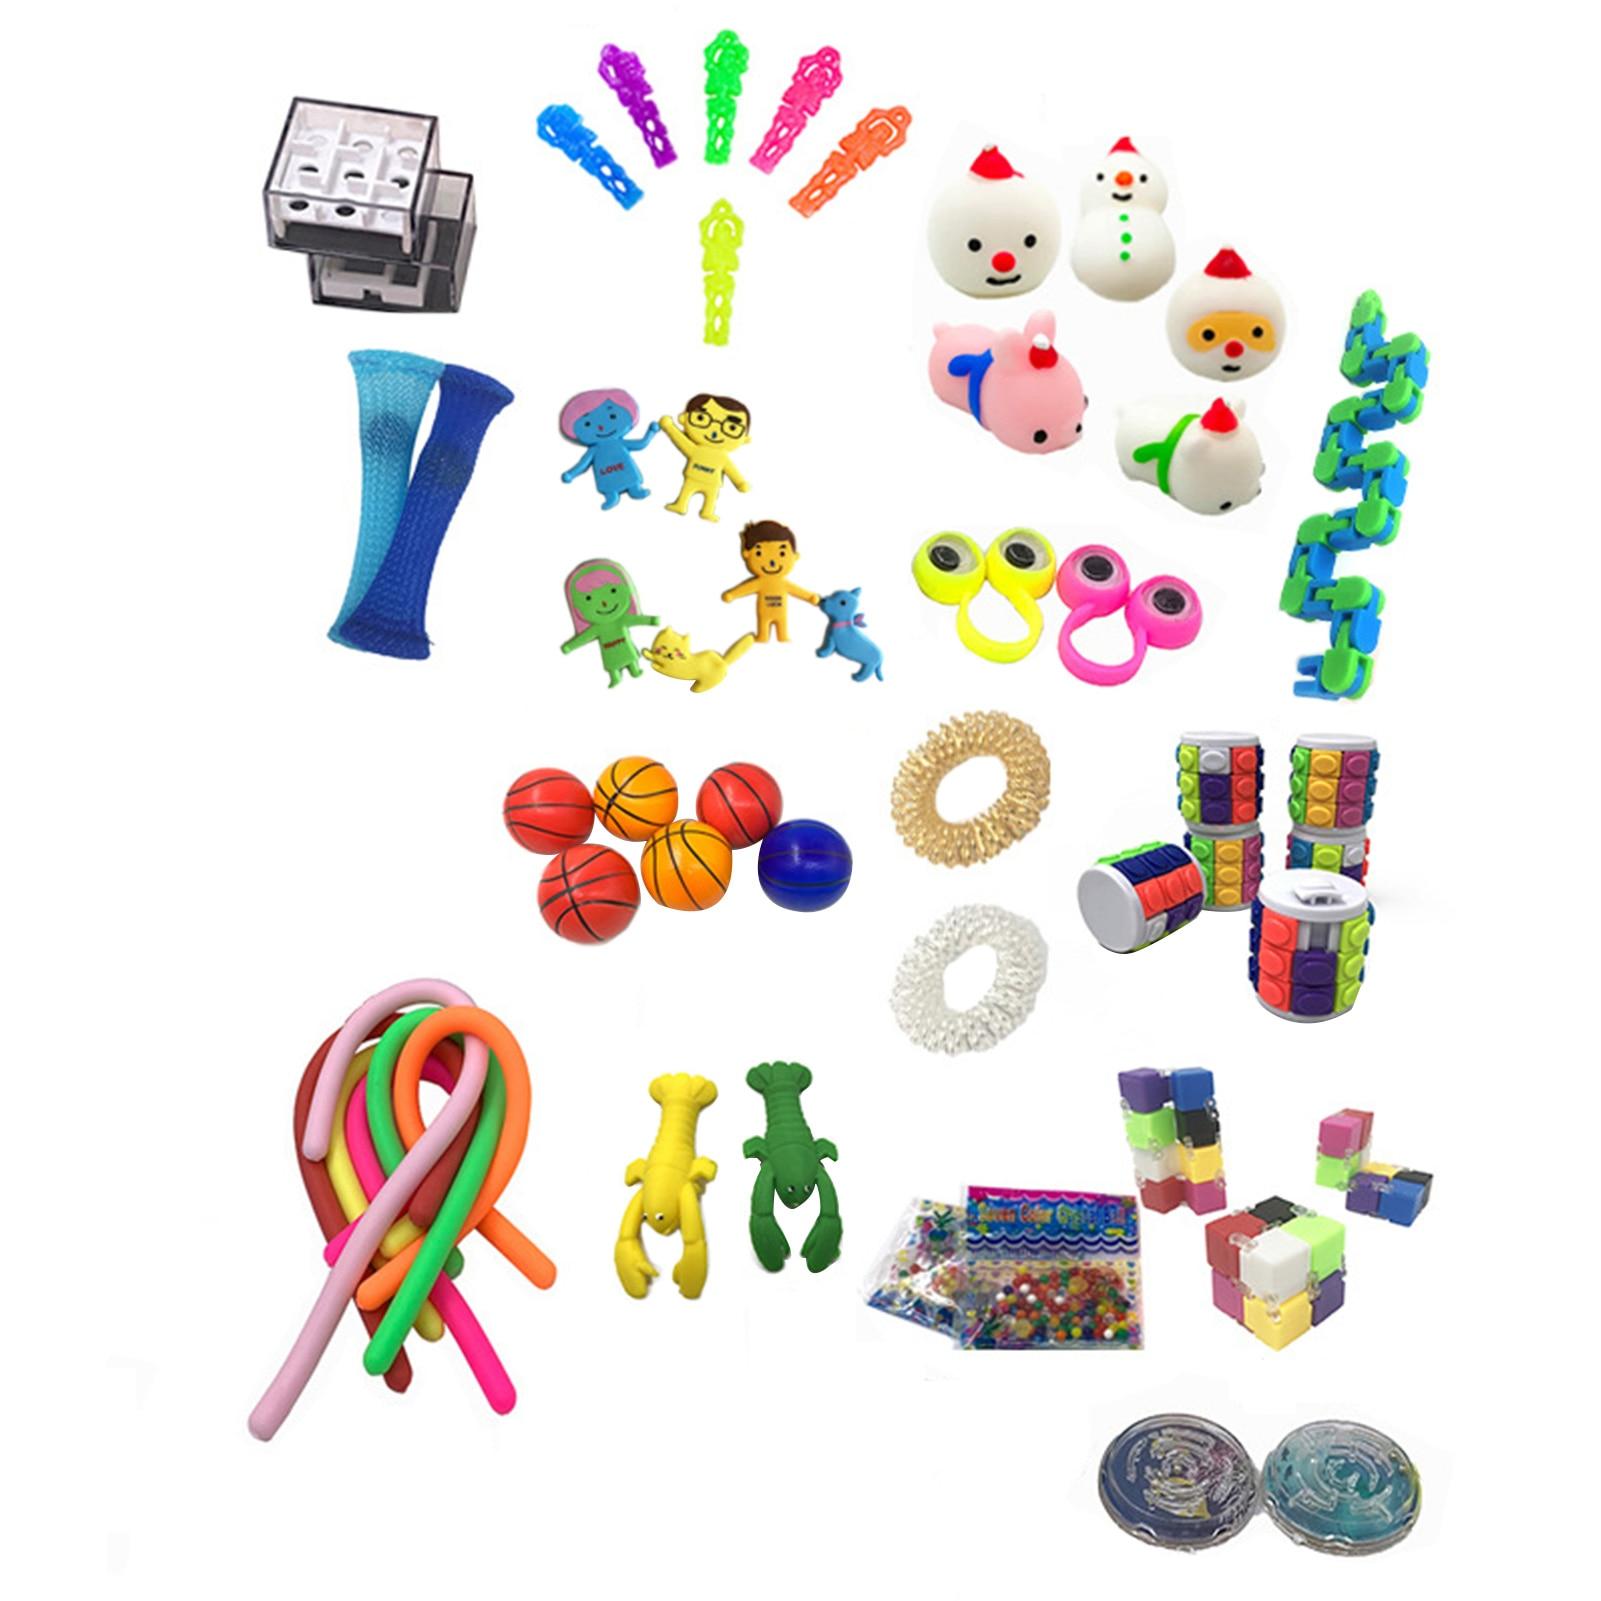 50Pcs/Pack Fidget Sensory Toy Set Stress Relief Toys Autism Anxiety Relief Stress Pop Bubble Fidget Sensory Toy For Kids Adults enlarge